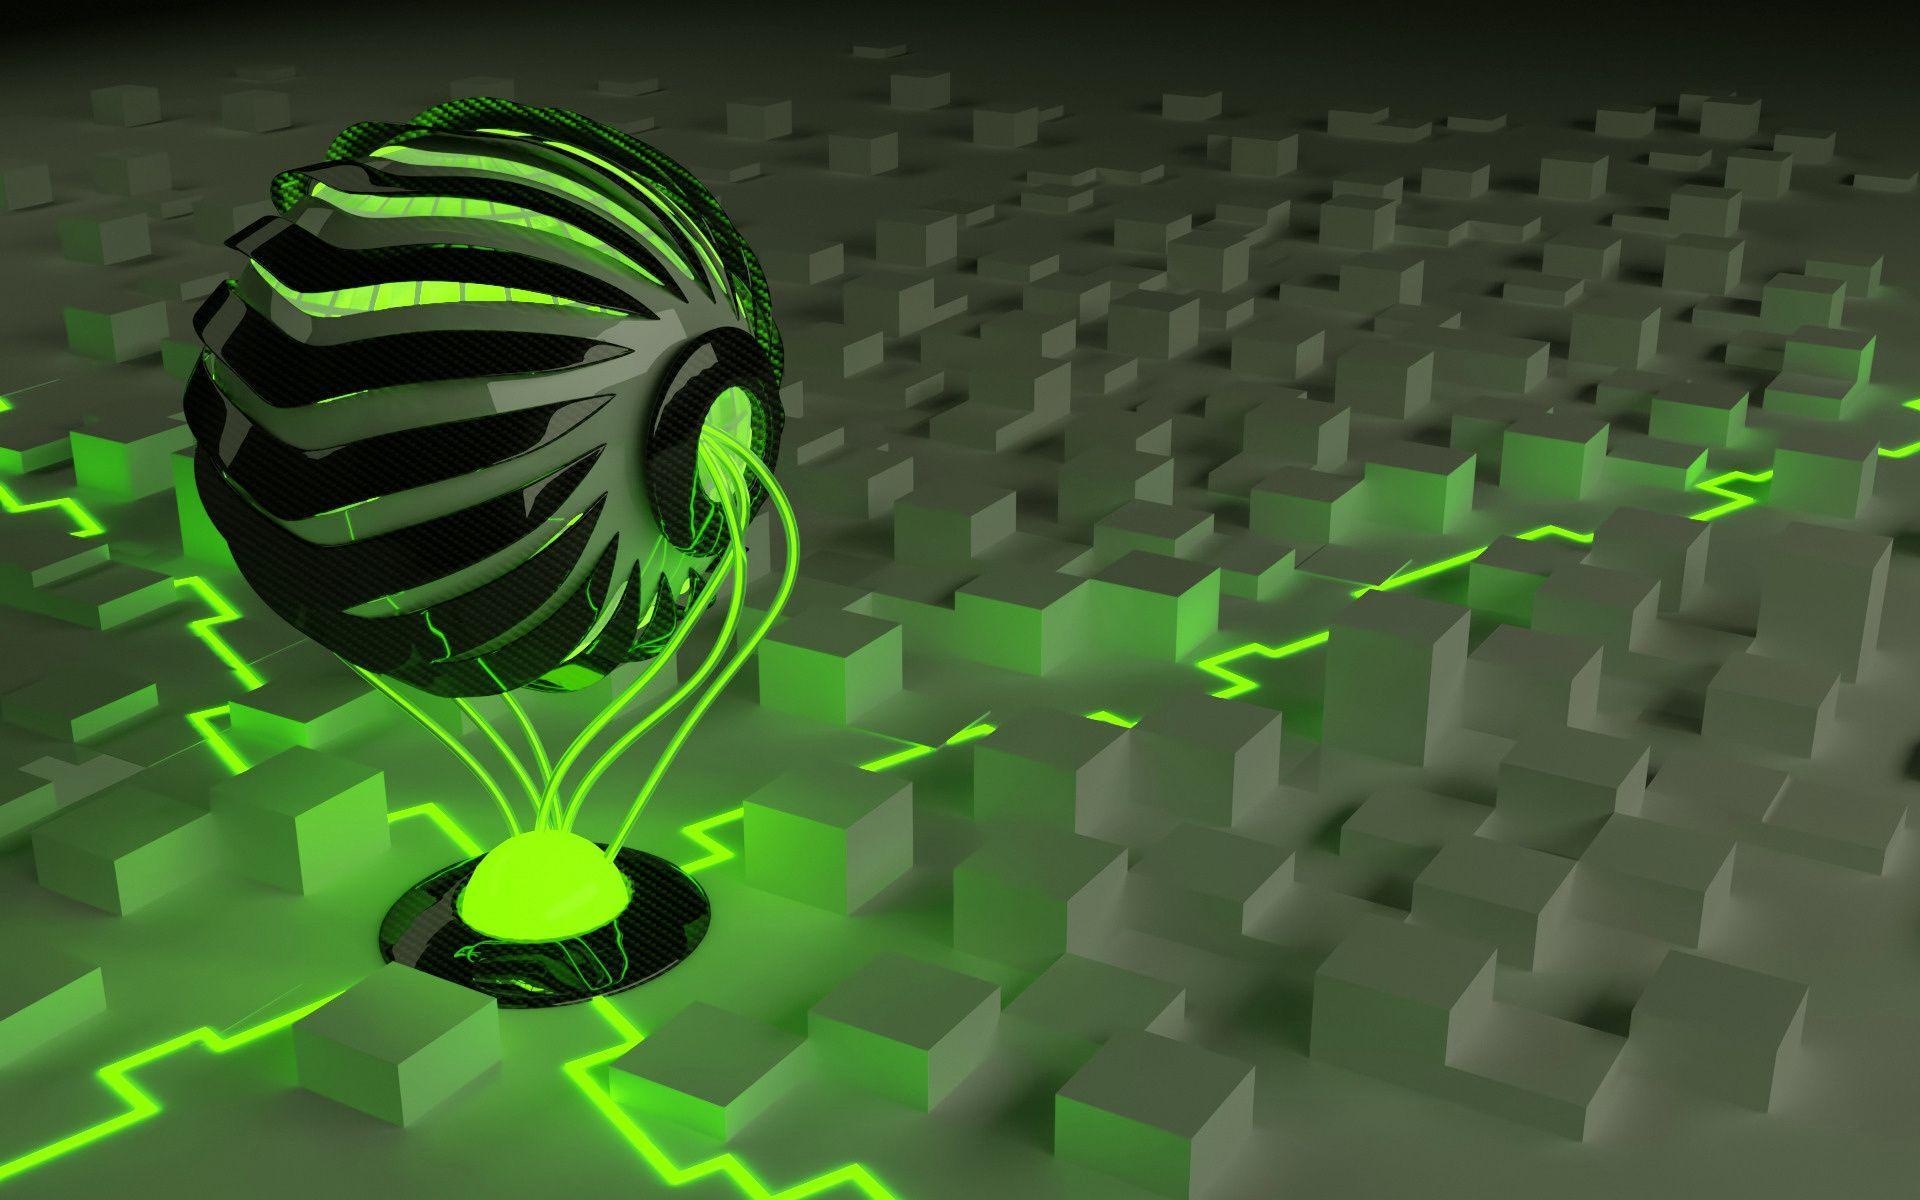 Wallpapers For Desktop 3d Animation Wallpaper Cave